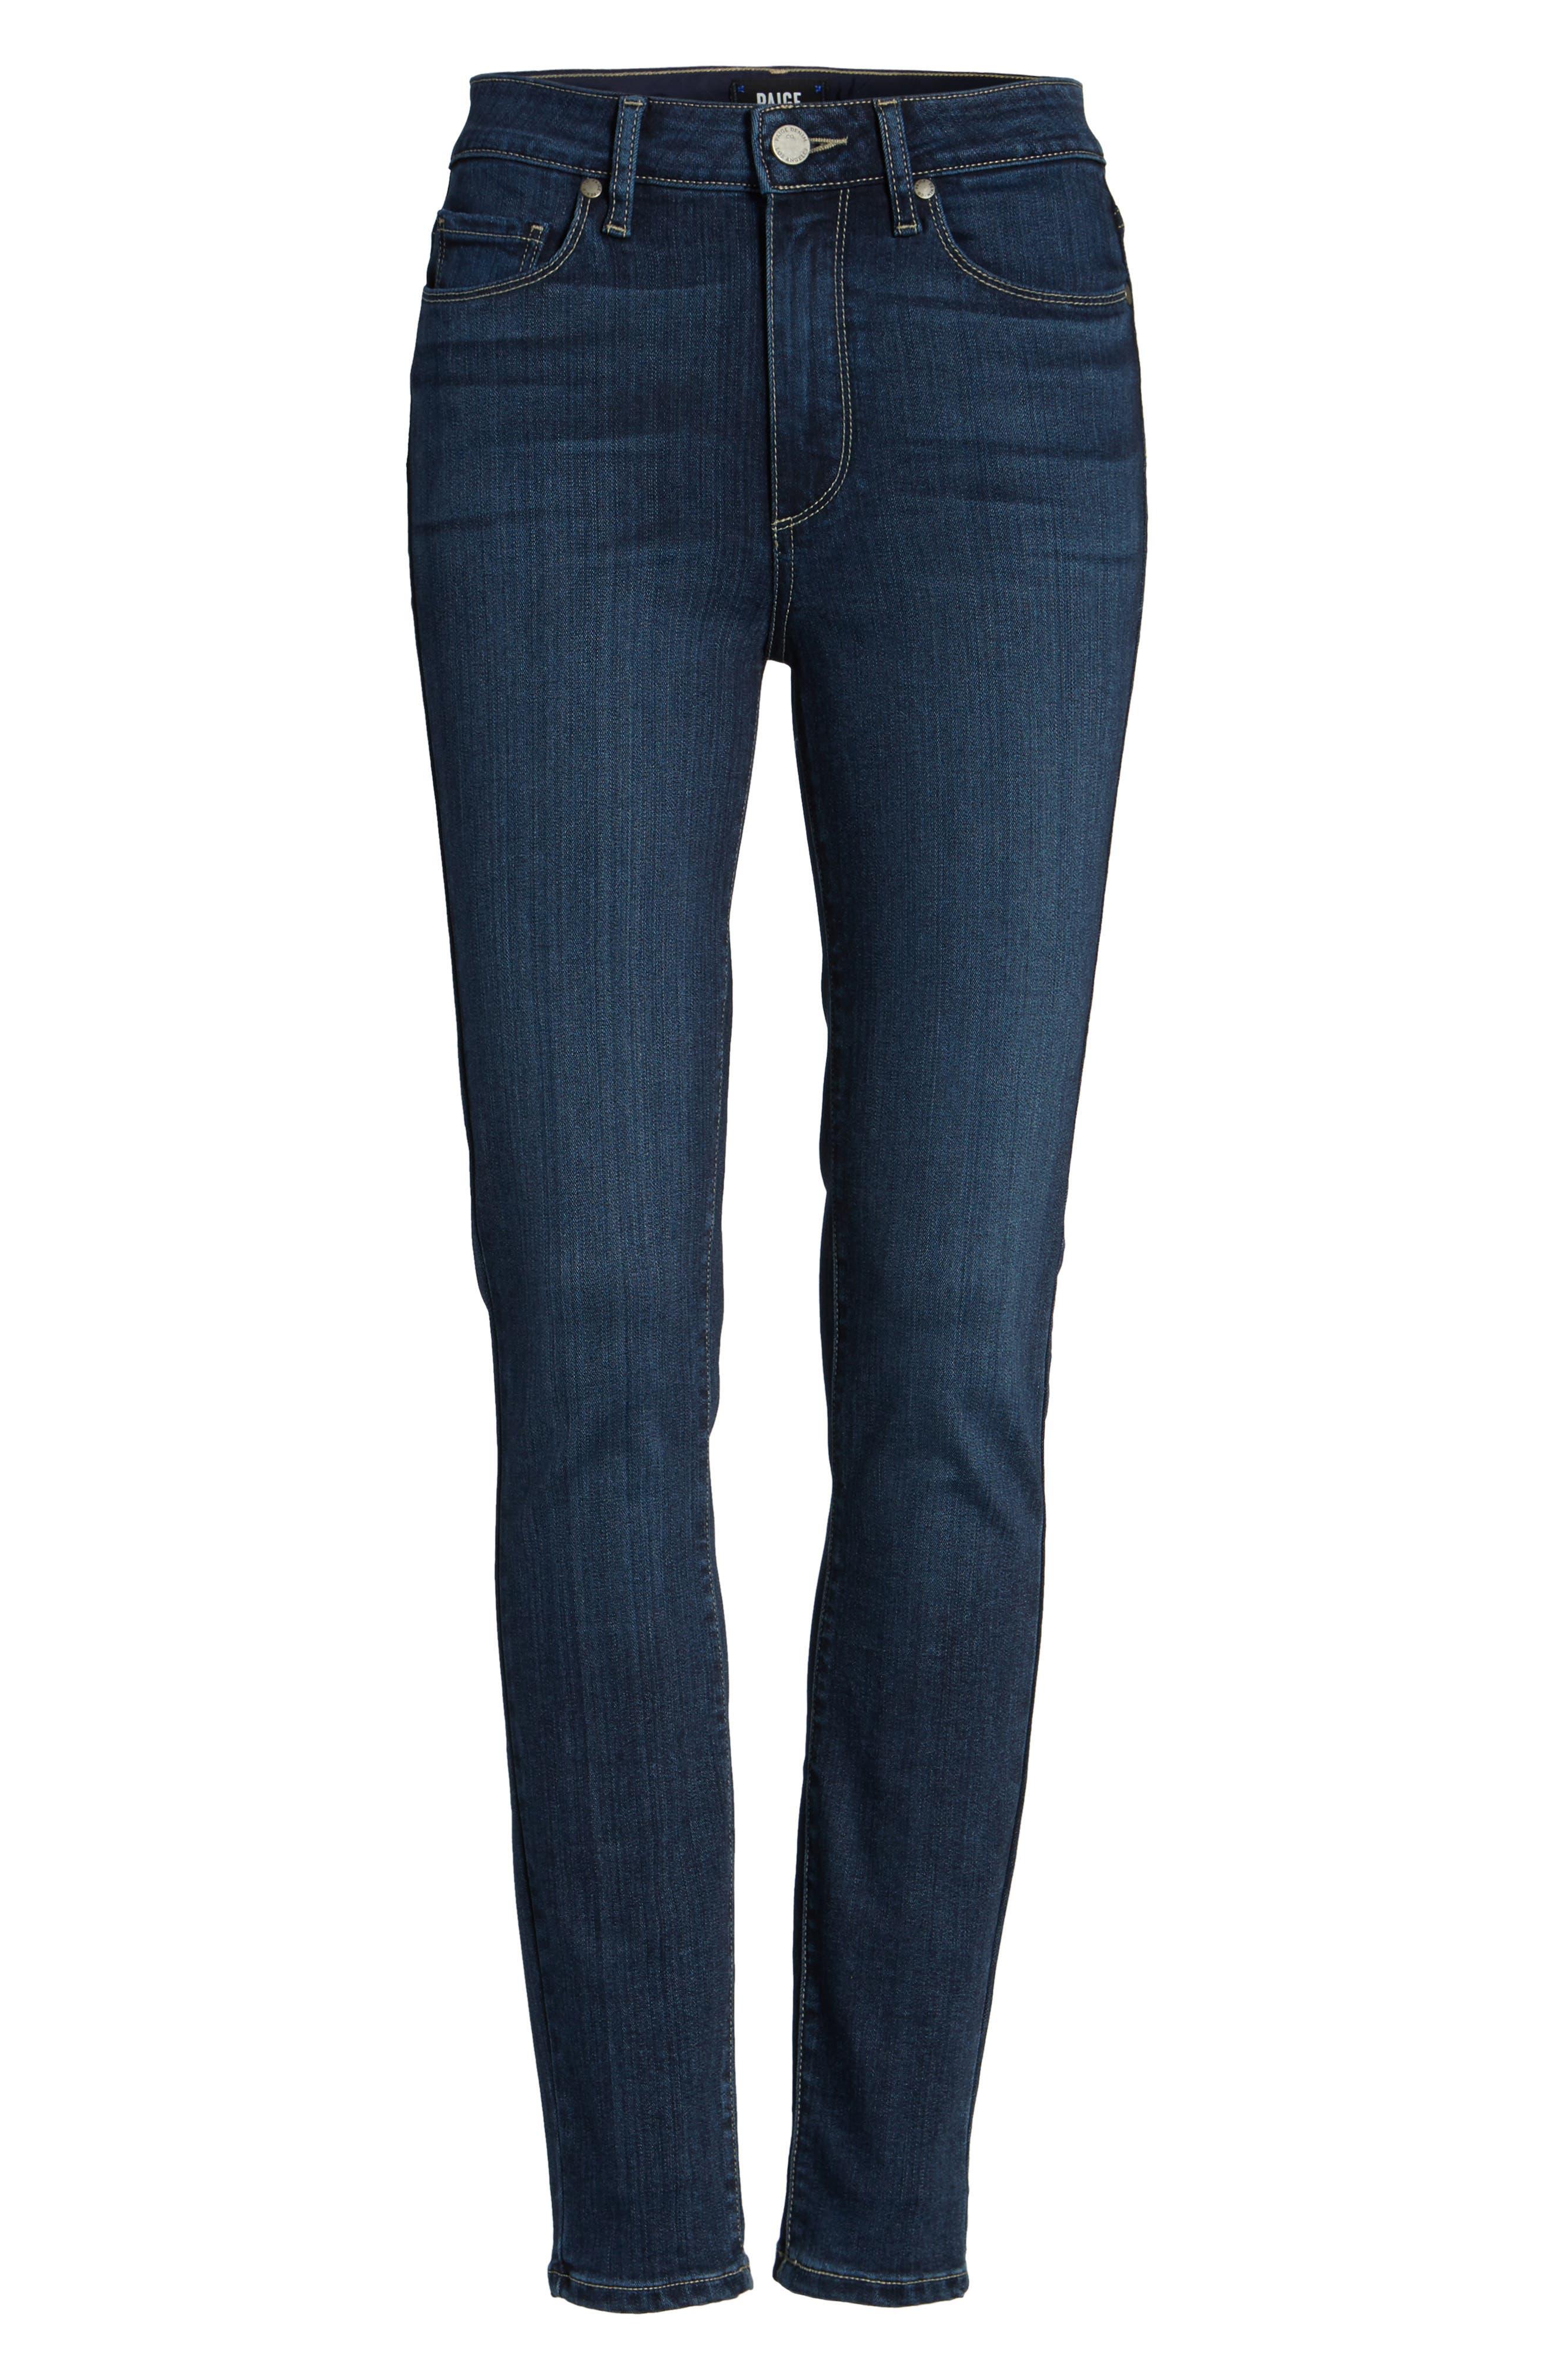 Transcend - Hoxton High Waist Ankle Skinny Jeans,                             Alternate thumbnail 7, color,                             400